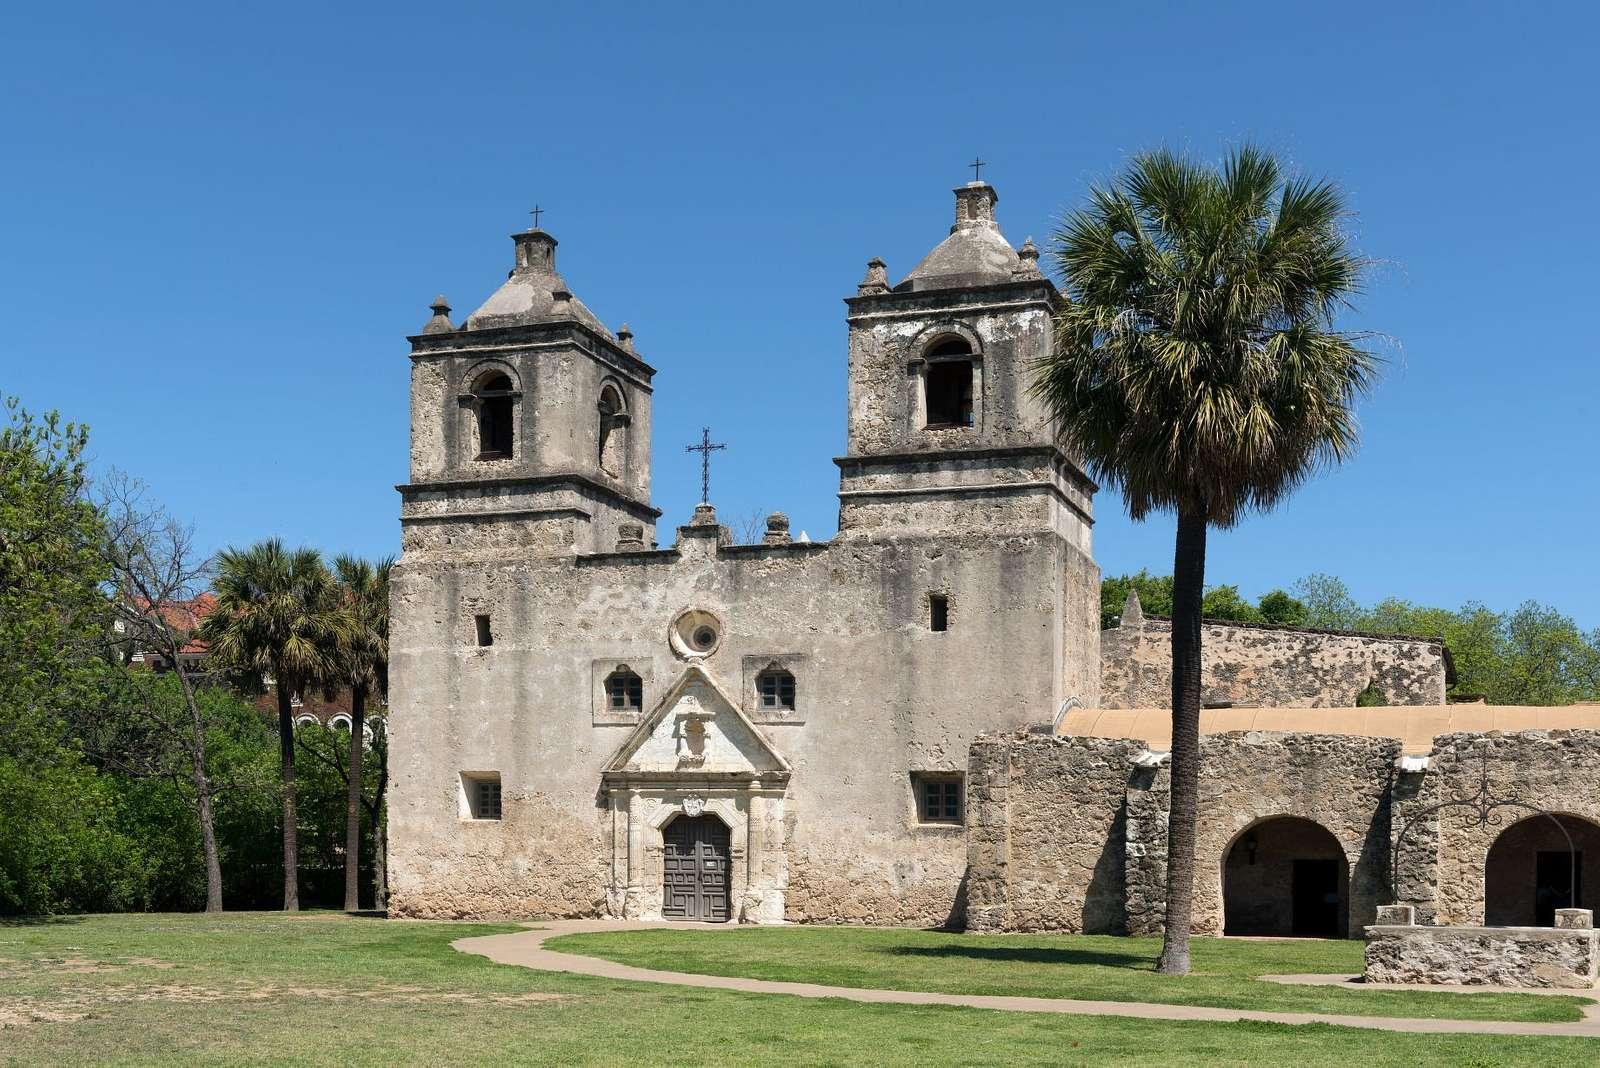 "Mission Nuestra Senora de la Purisima Concepcion de Acuna, better known as simply ""Mission Concepcion"" today, is one of four surviving Spanish missions in San Antonio, Texas"